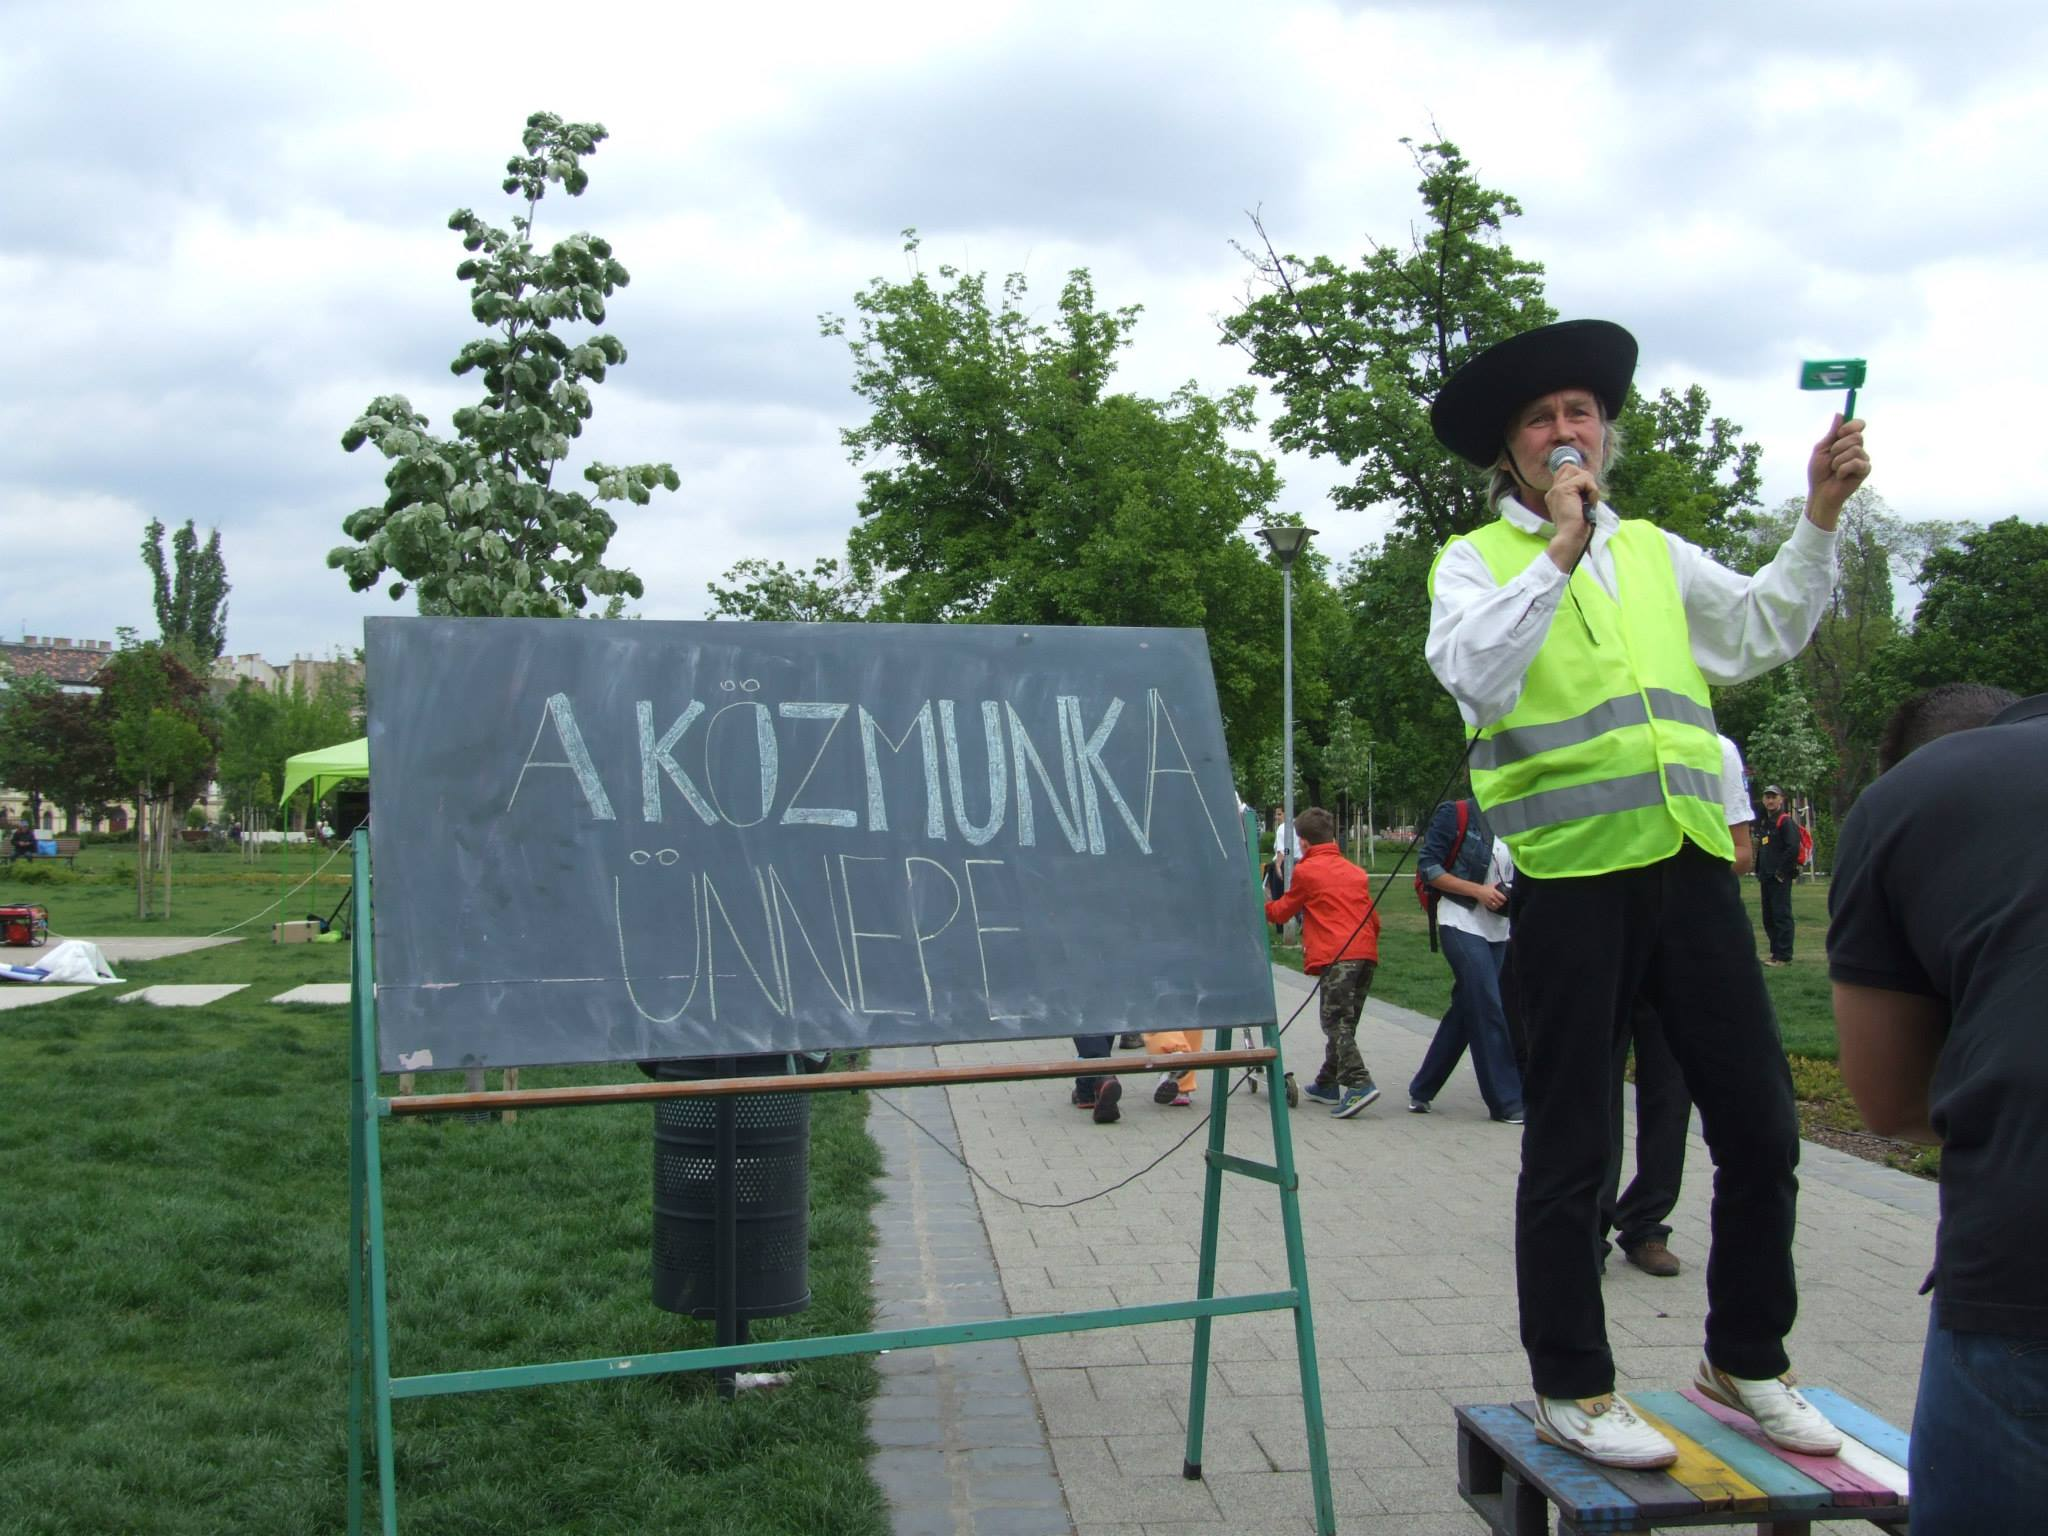 a_kozmunka_unnepe_2015_majus_1.jpg